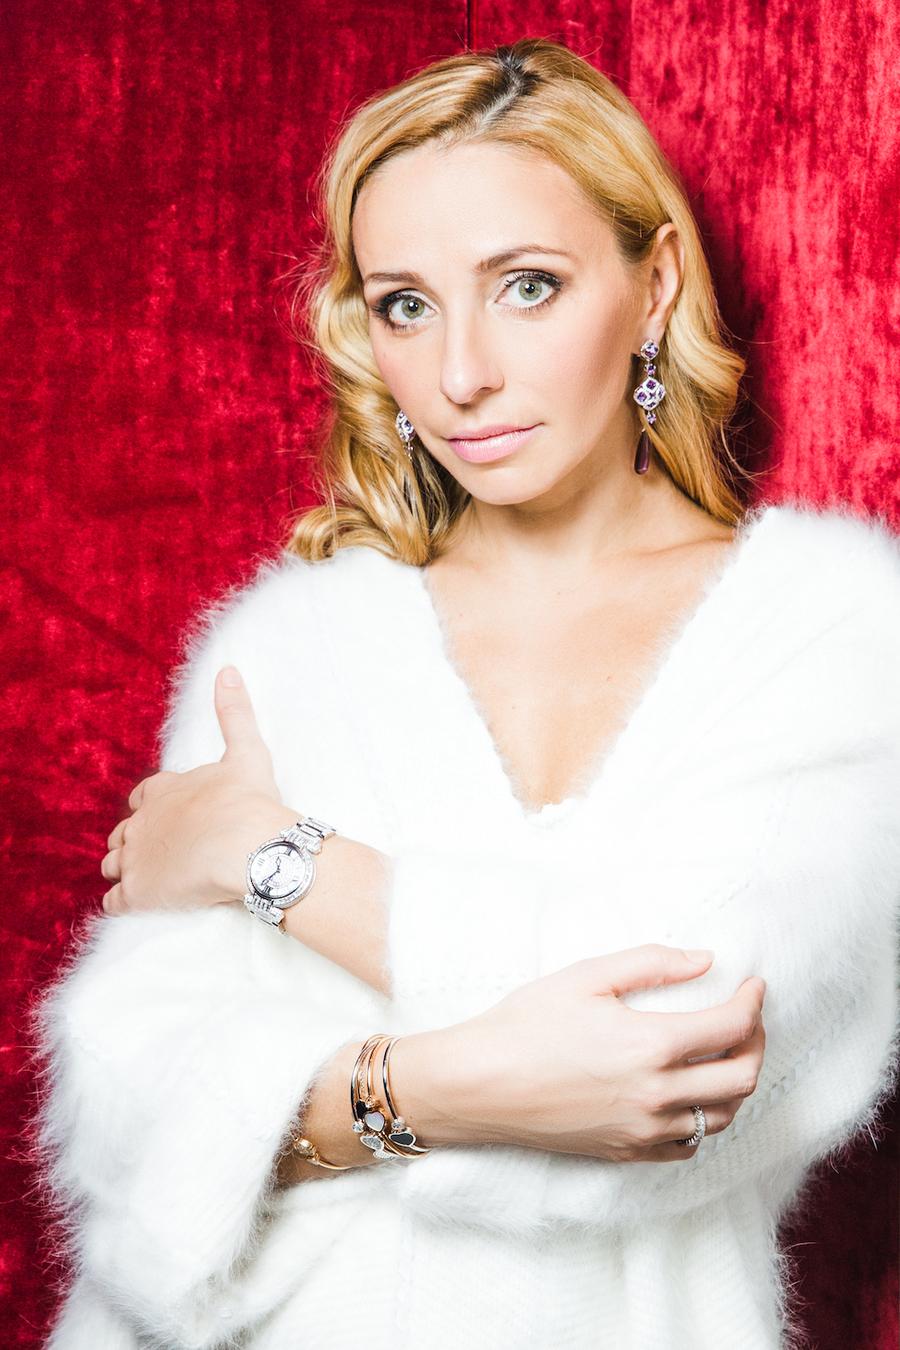 Татьяна Навка - официальный посол бренда Chopard E3f0dbad2df0